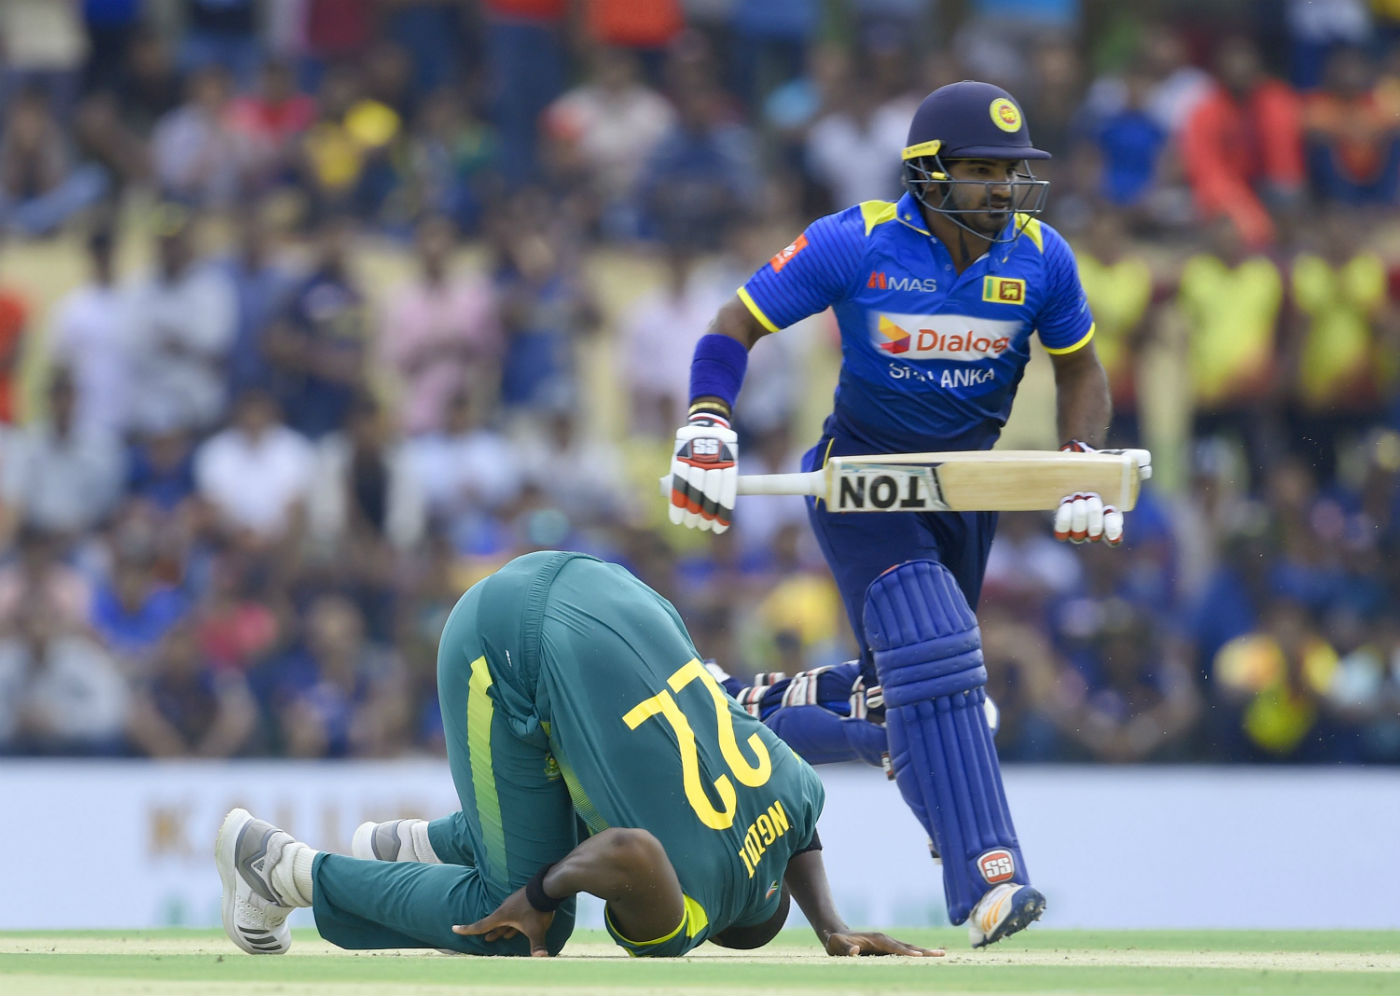 Sri Lanka vs England 2018: Hamstring Injury Rules Kusal Perera Out Of Series 3